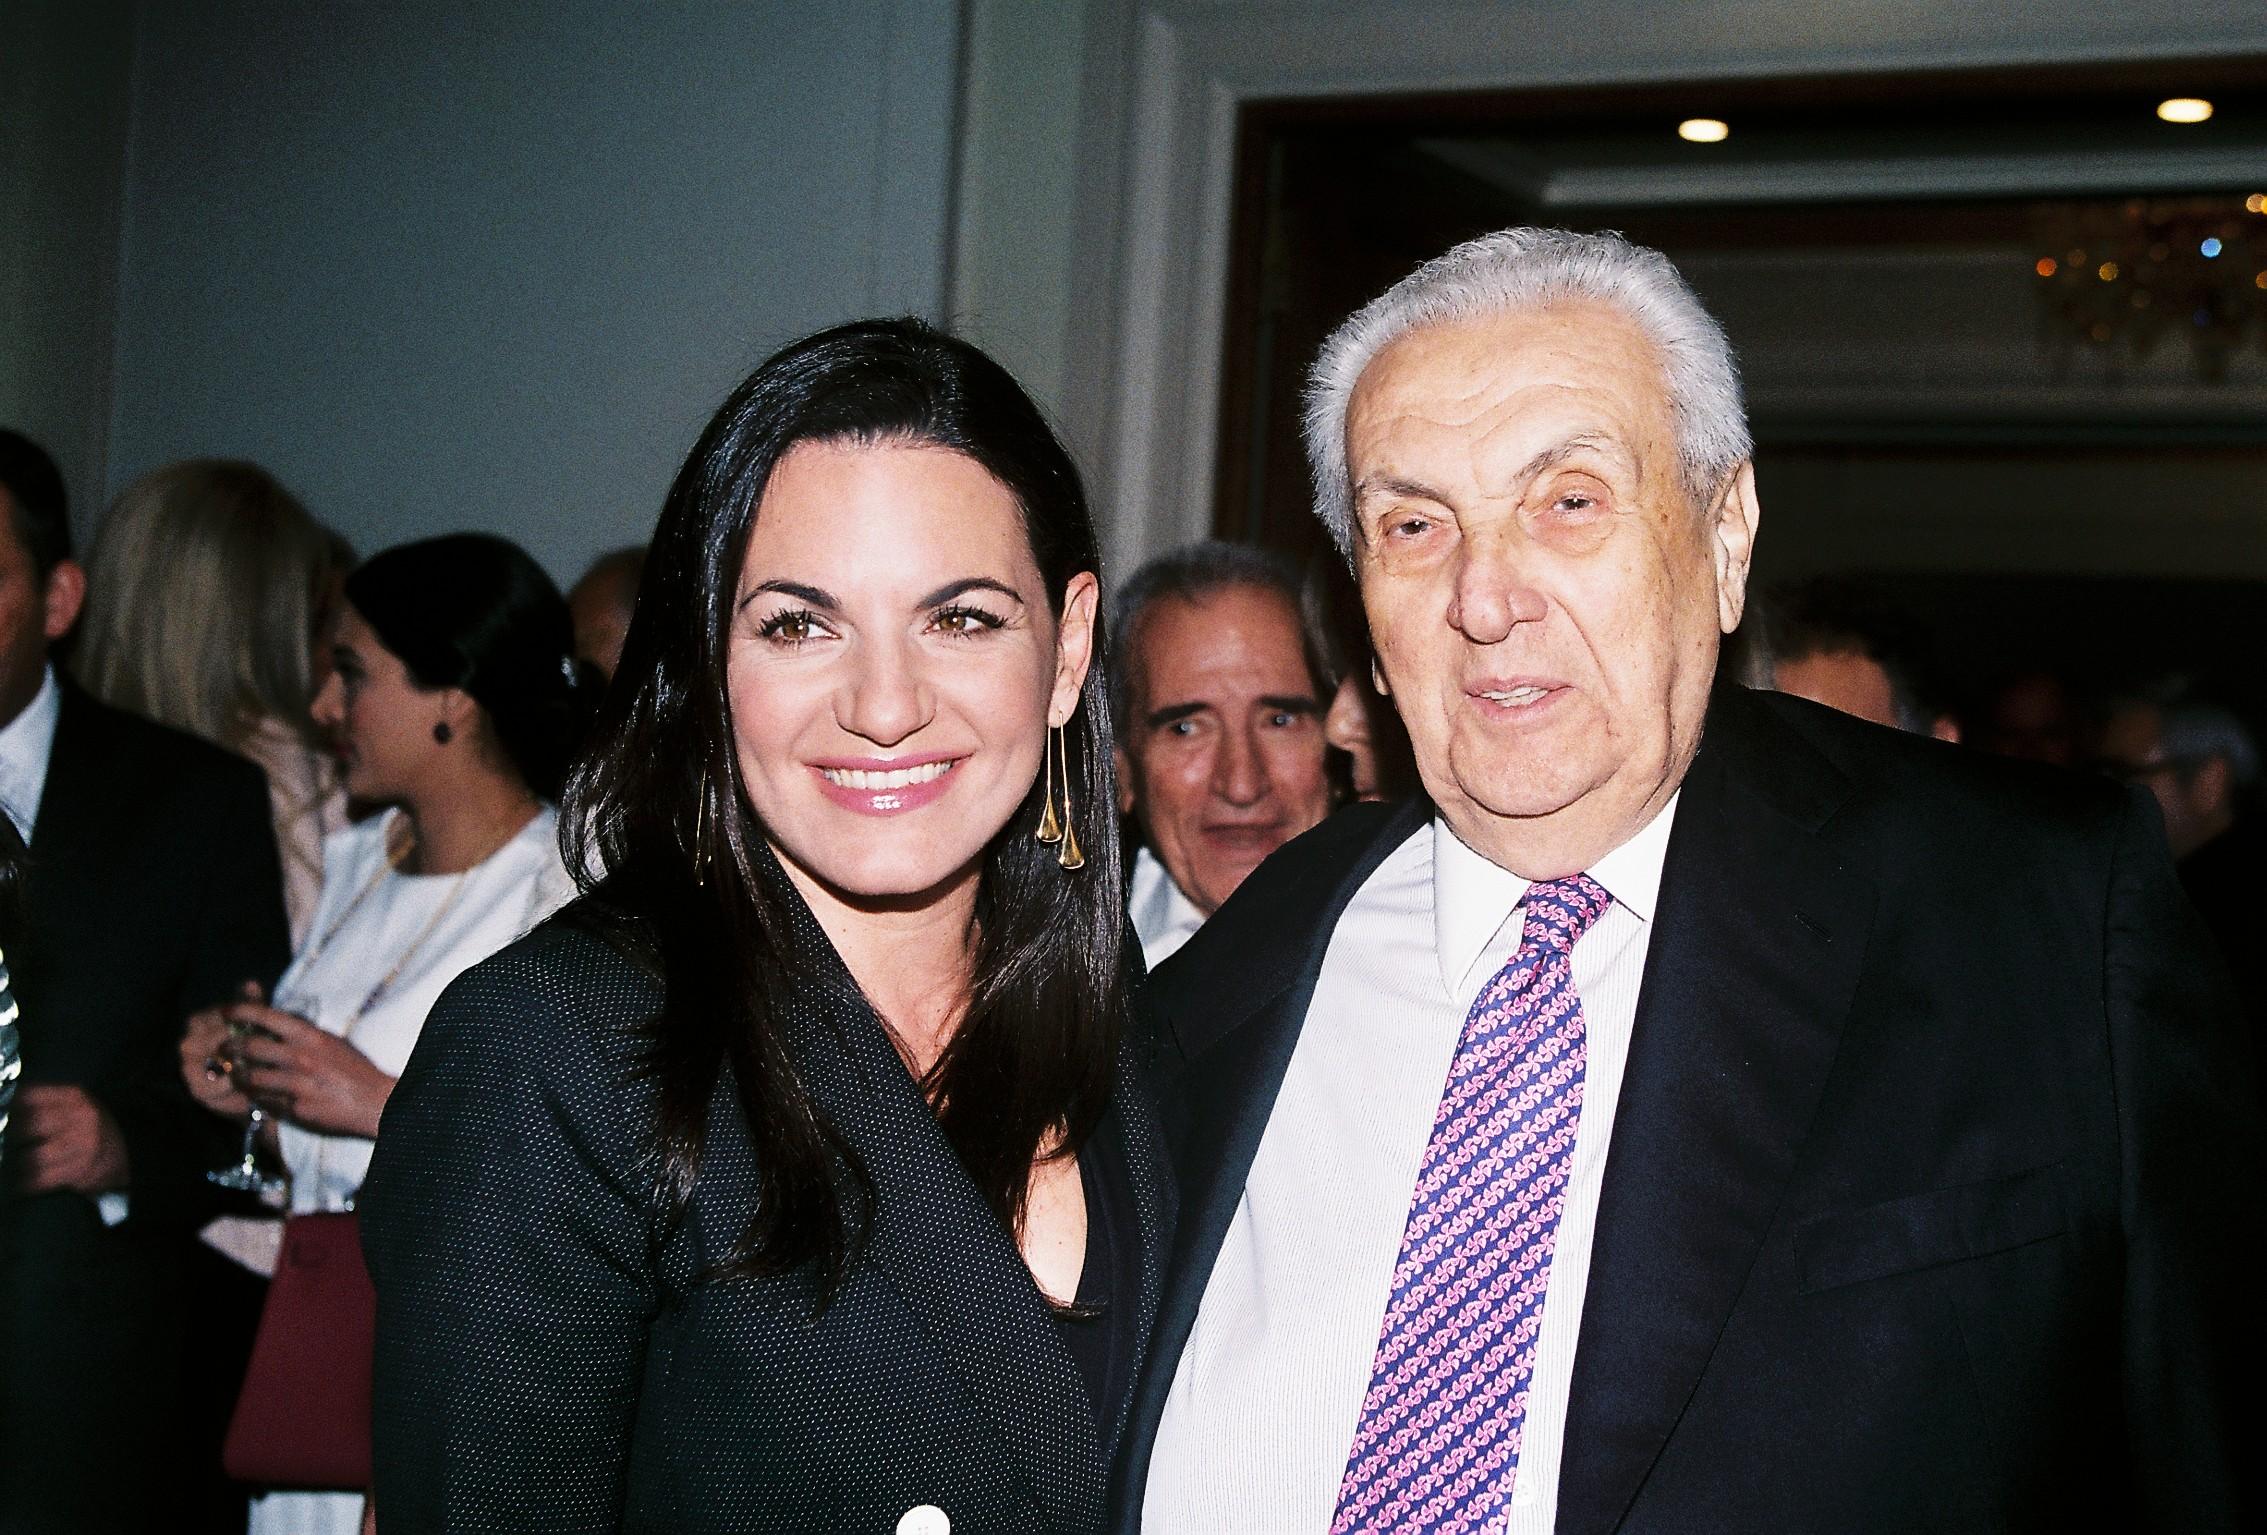 Former Minister of Tourism, Olga Kefalogianni and Dimitri Contominas